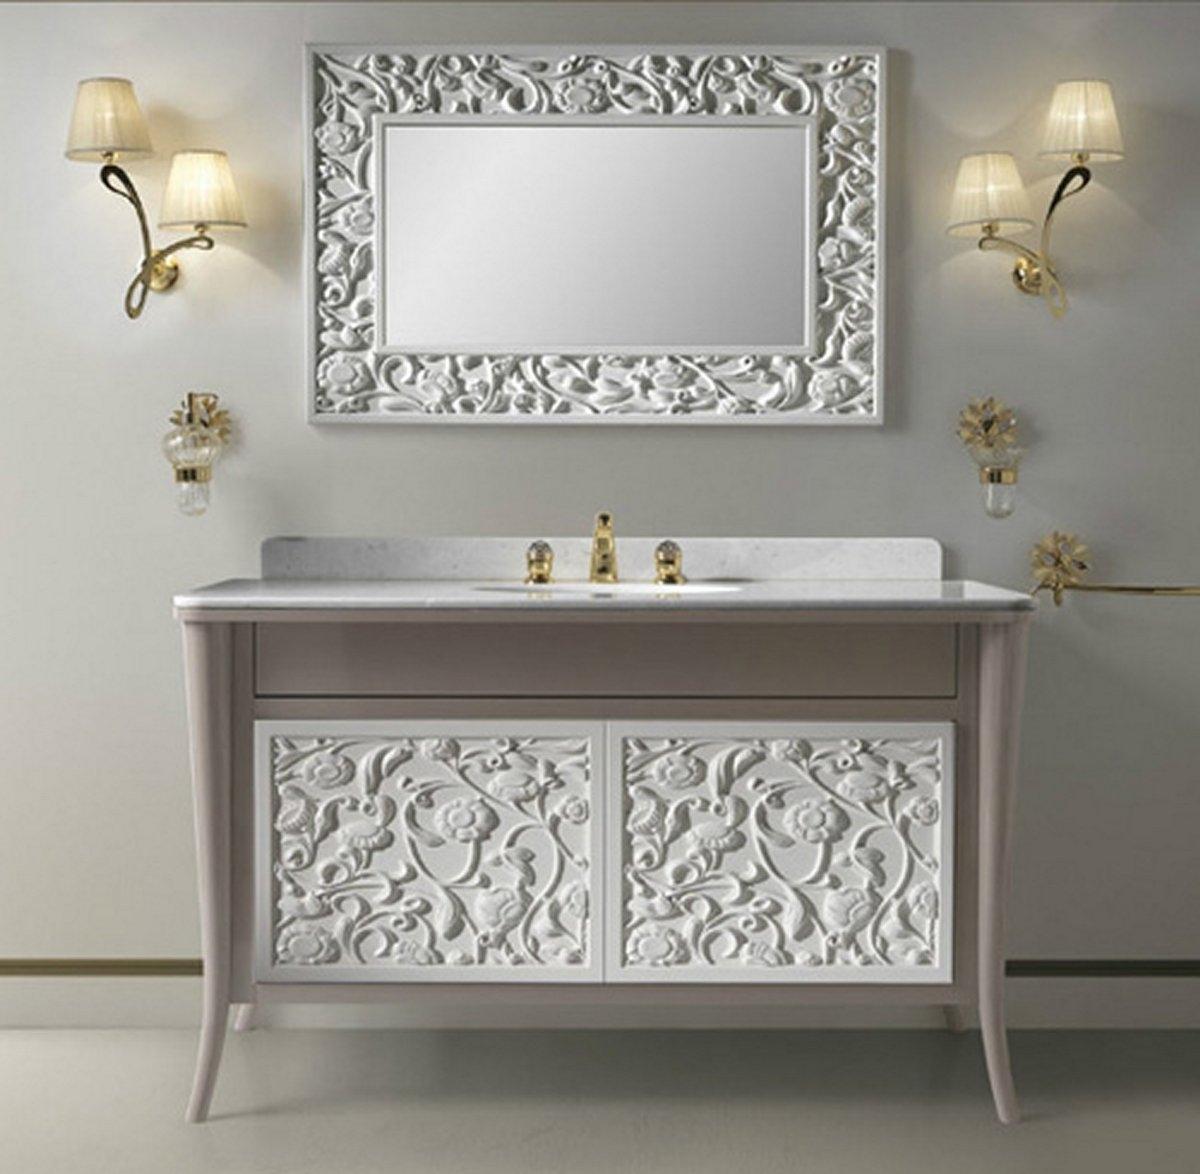 Vintage Bathroom Mirrors Home Decor Vintage Style Bathroom With Vintage Style Bathroom Mirror (Image 13 of 15)